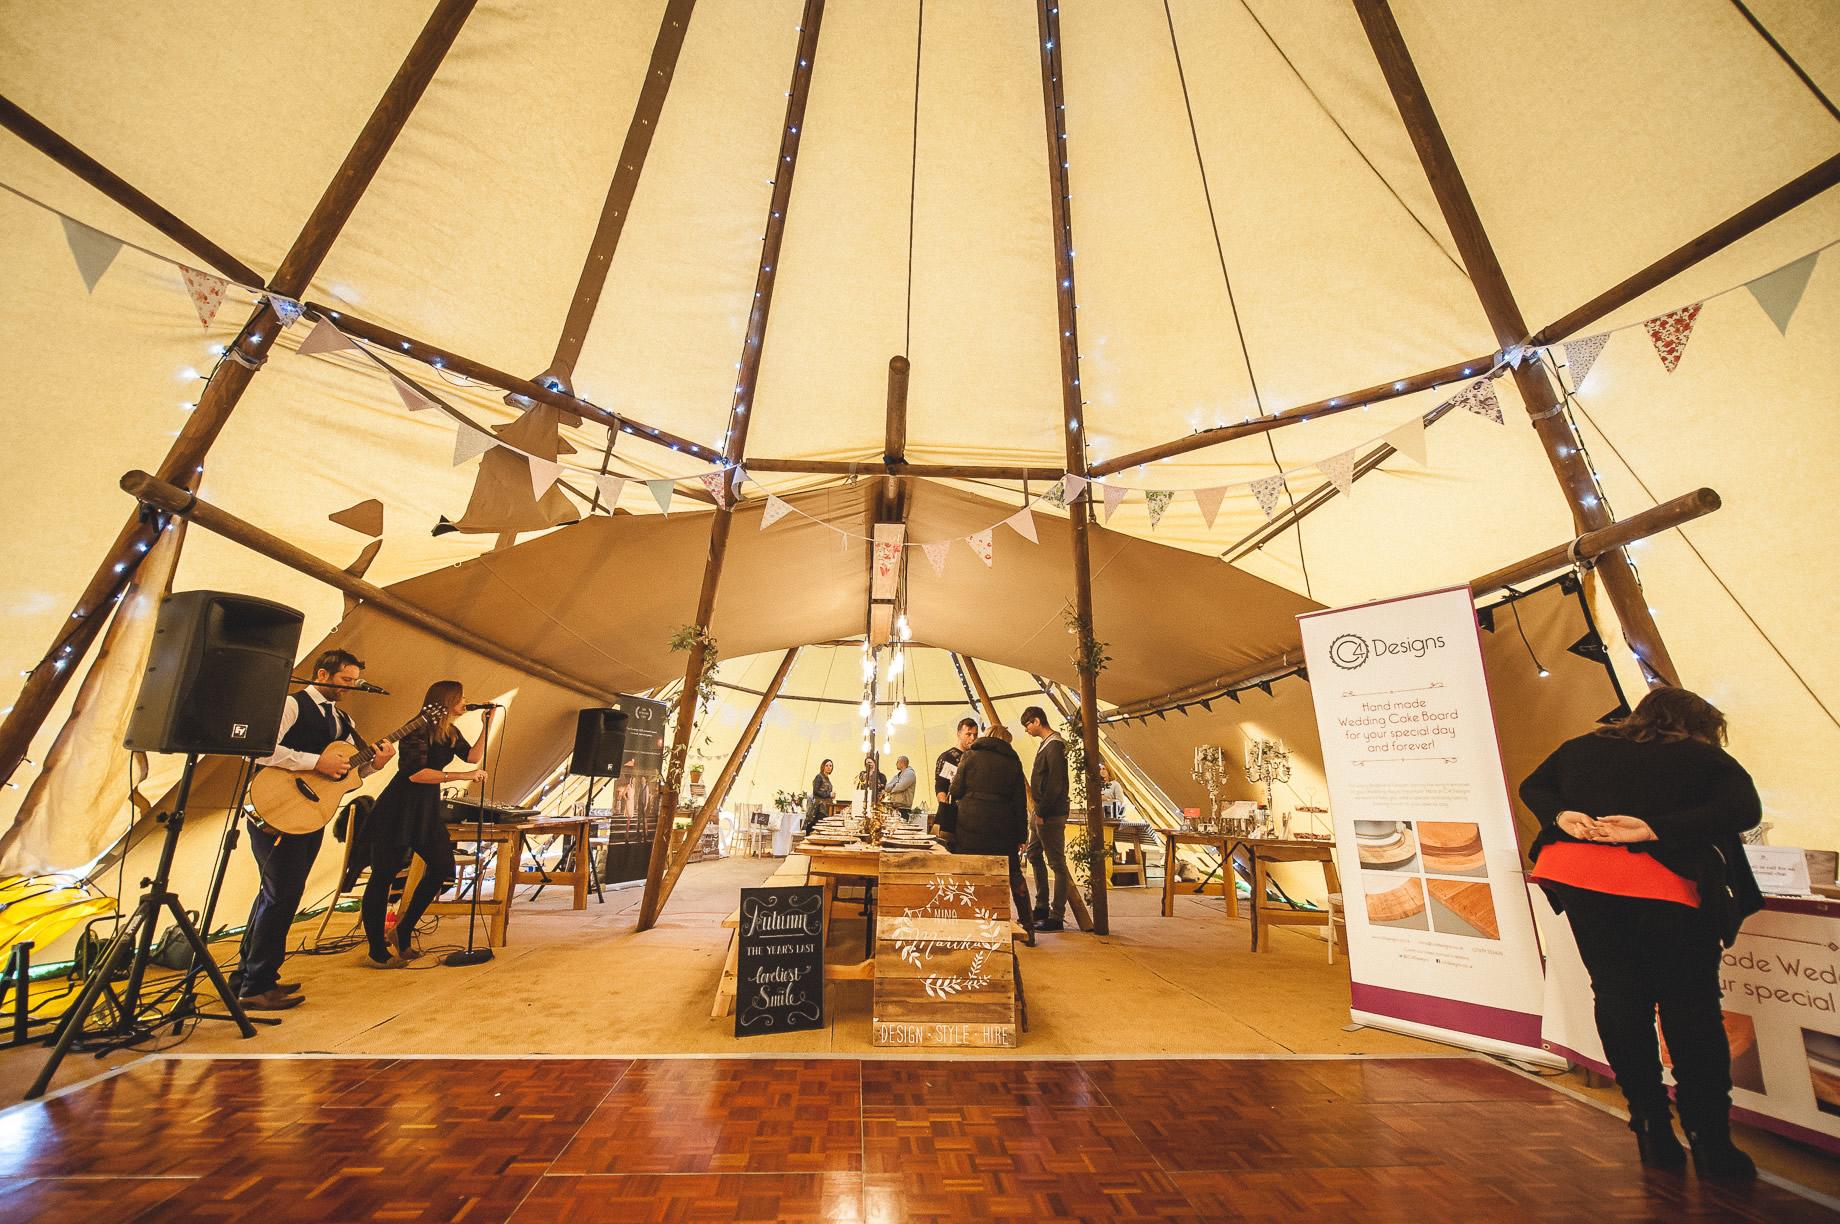 Teepee Tent Hire Open Weekend on Hoghton Cricket Field 033